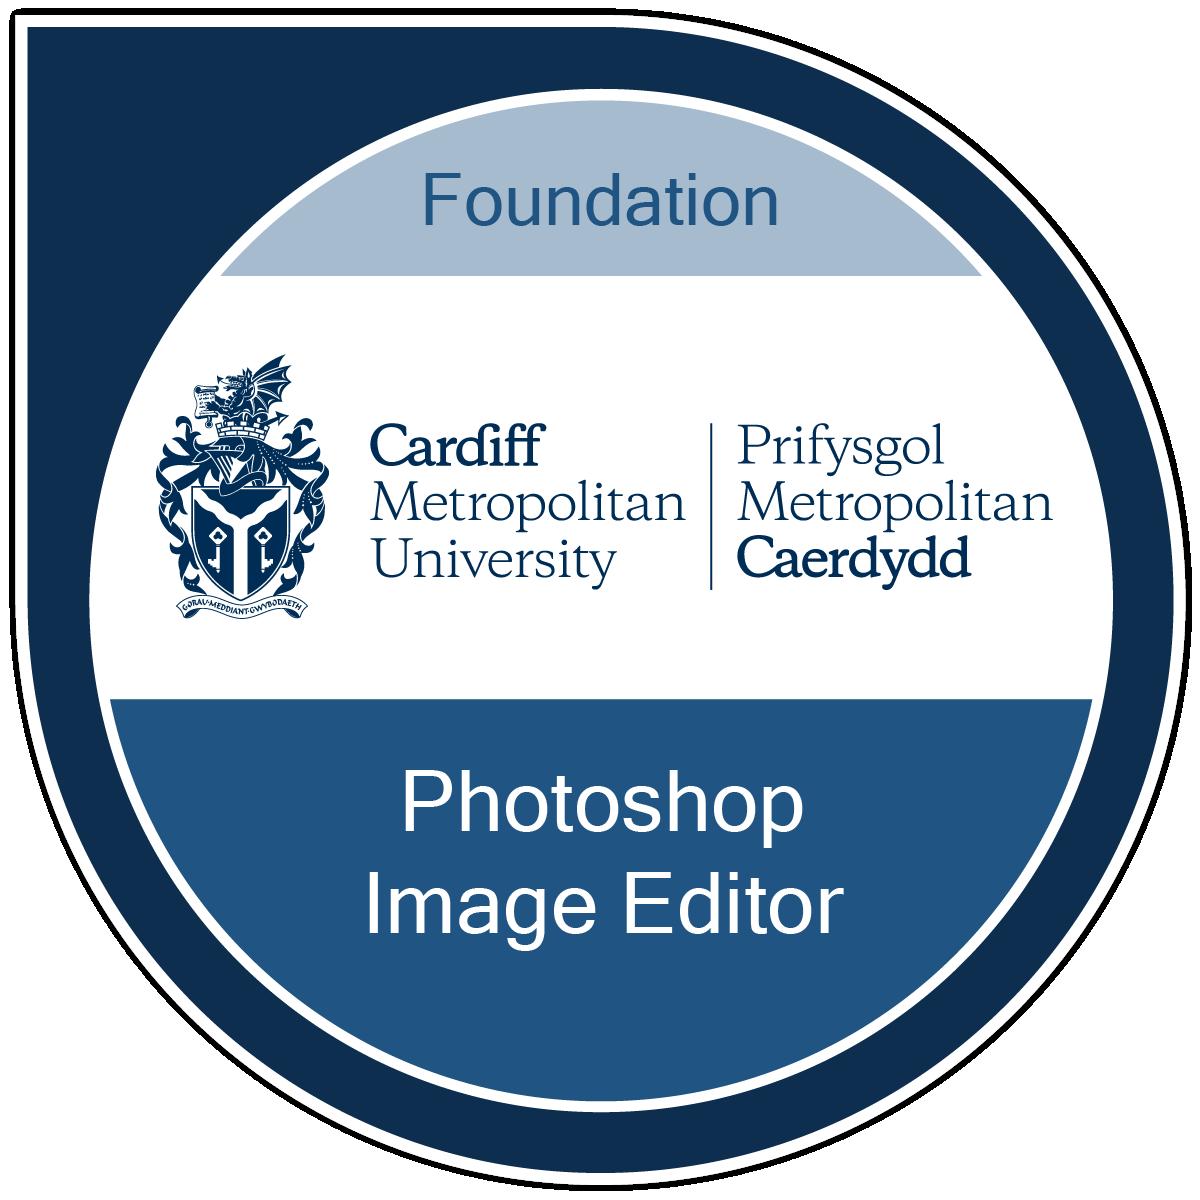 Photoshop Foundation digital